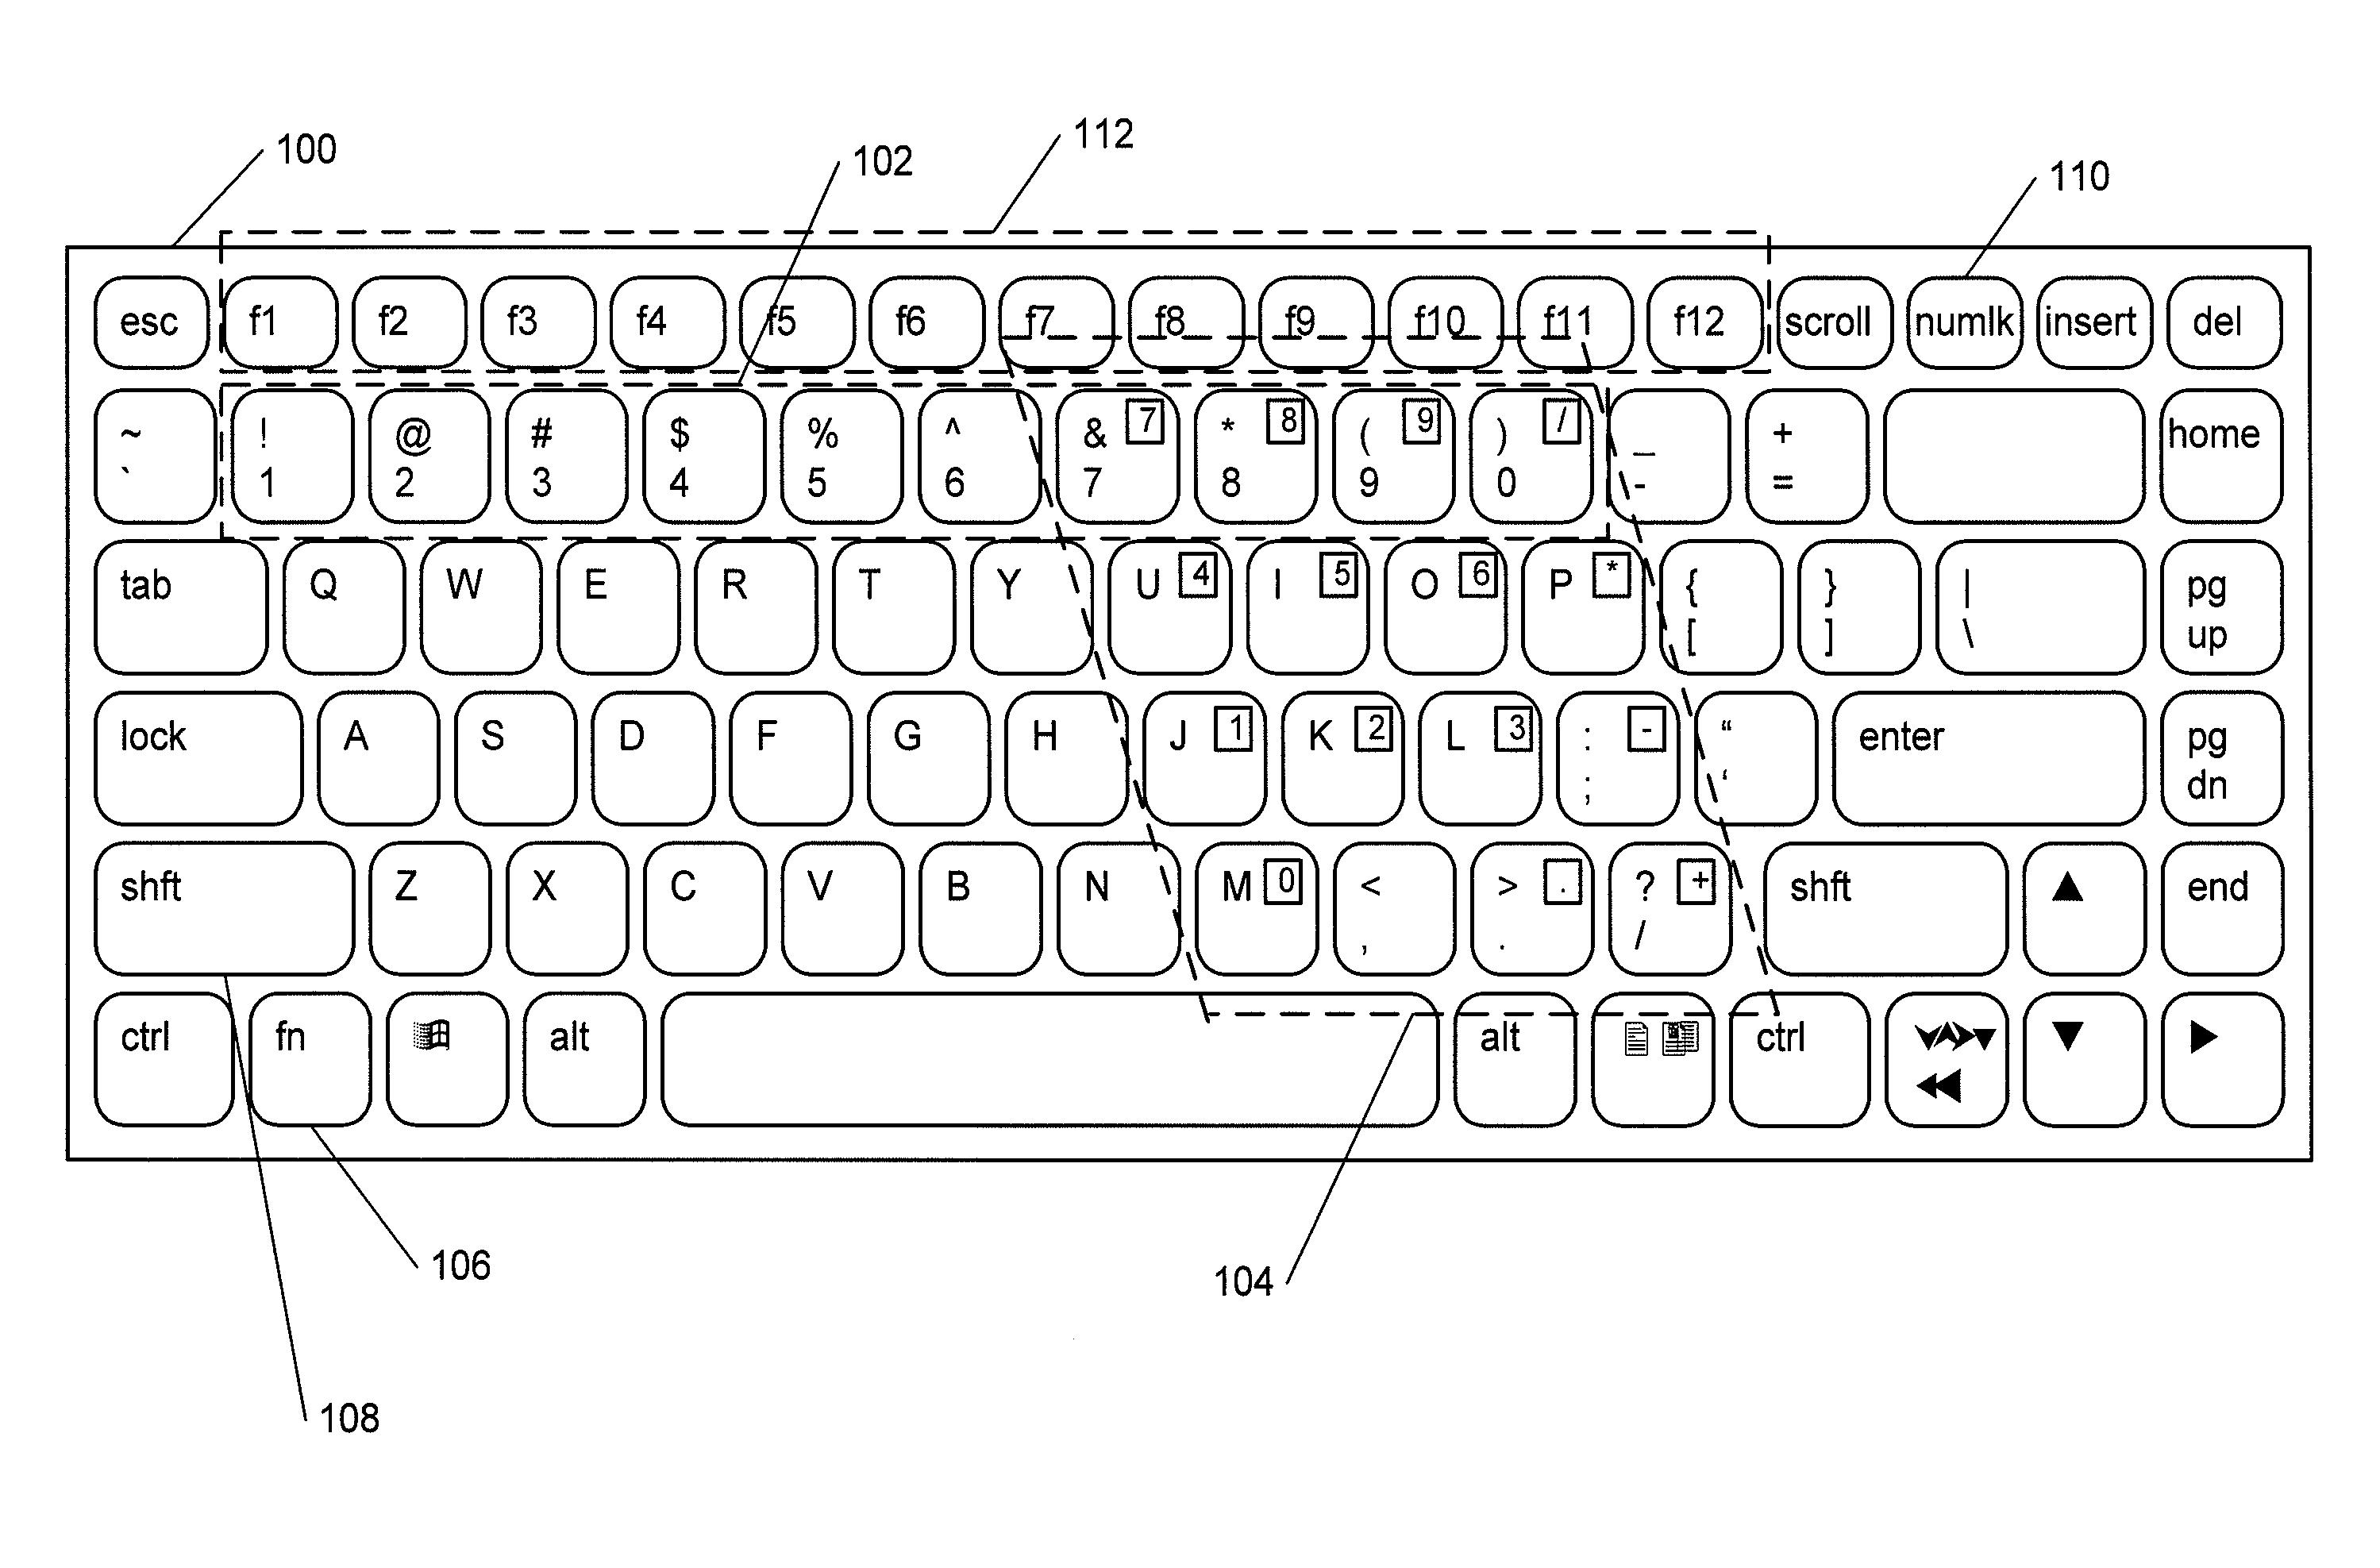 Micron symbol on keyboard images symbol and sign ideas drawing with keyboard symbols images symbol and sign ideas floor plan symbols at home and interior biocorpaavc